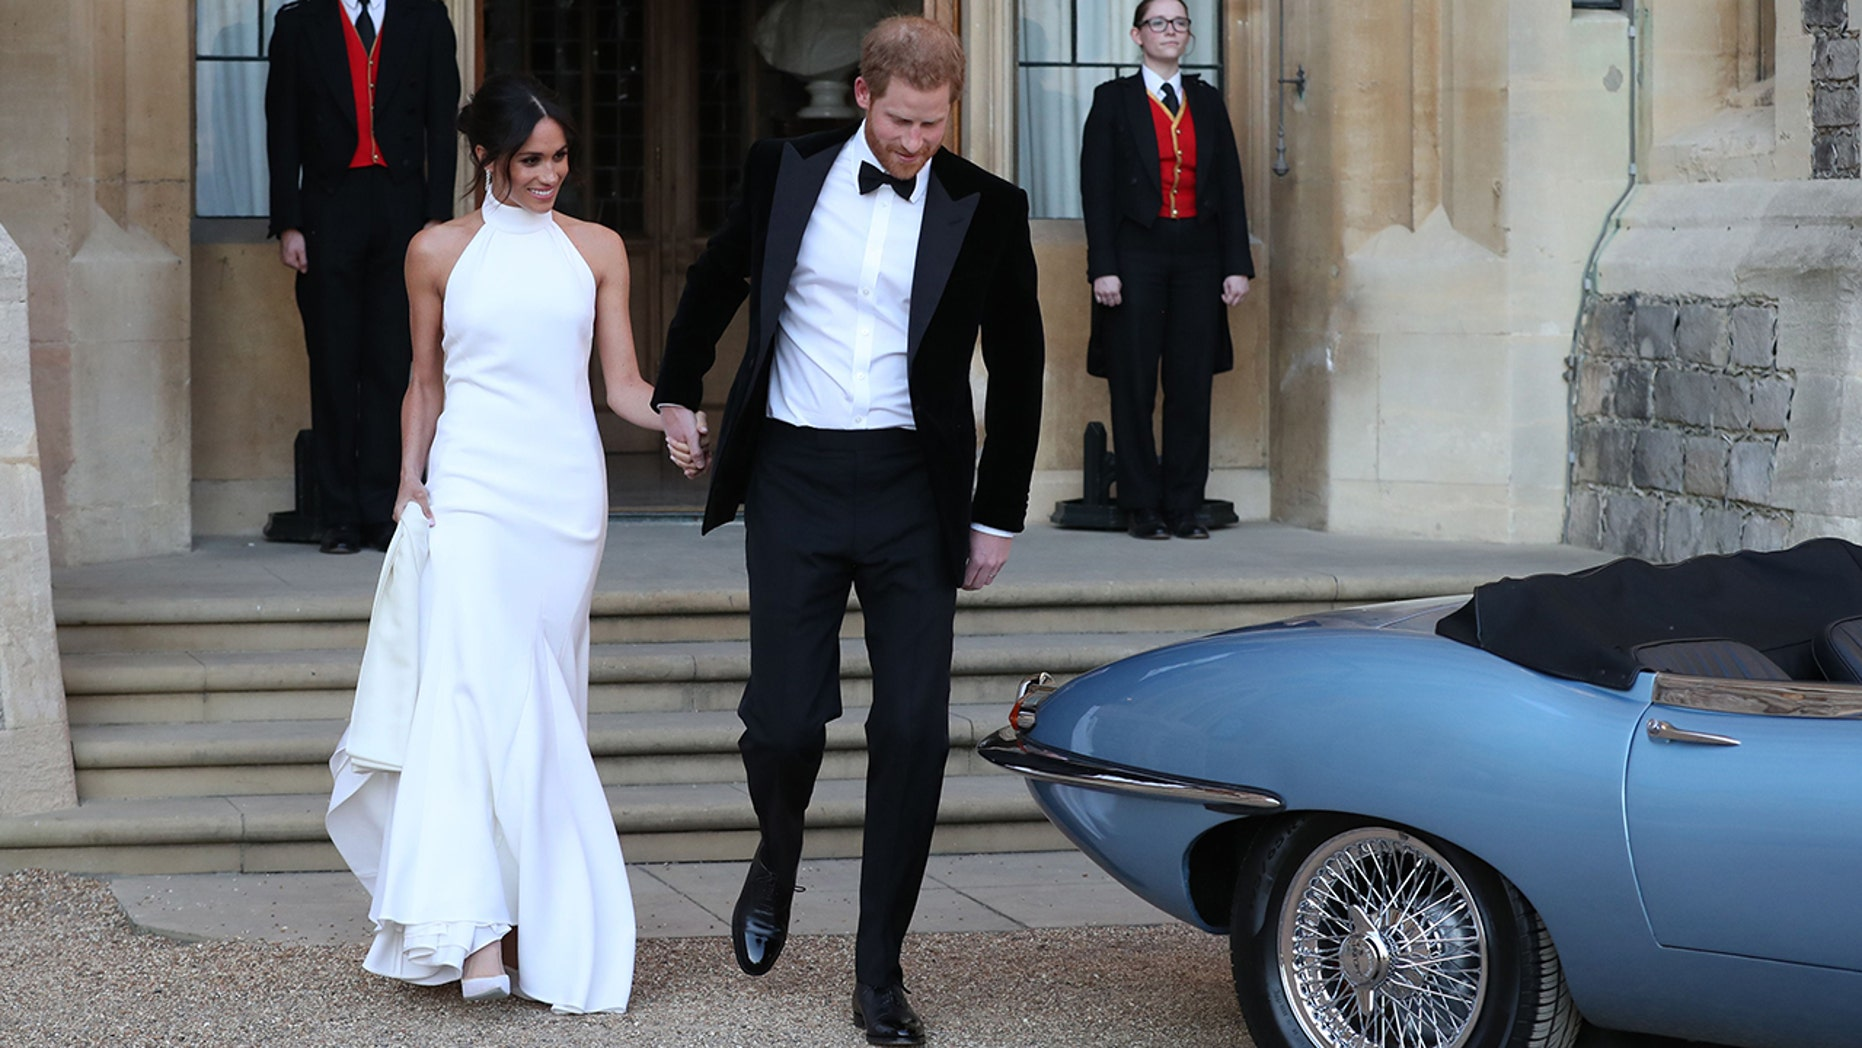 Meghan Markle's stunning Stella McCartney wedding reception dress won't be on display in an upcoming exhibit.